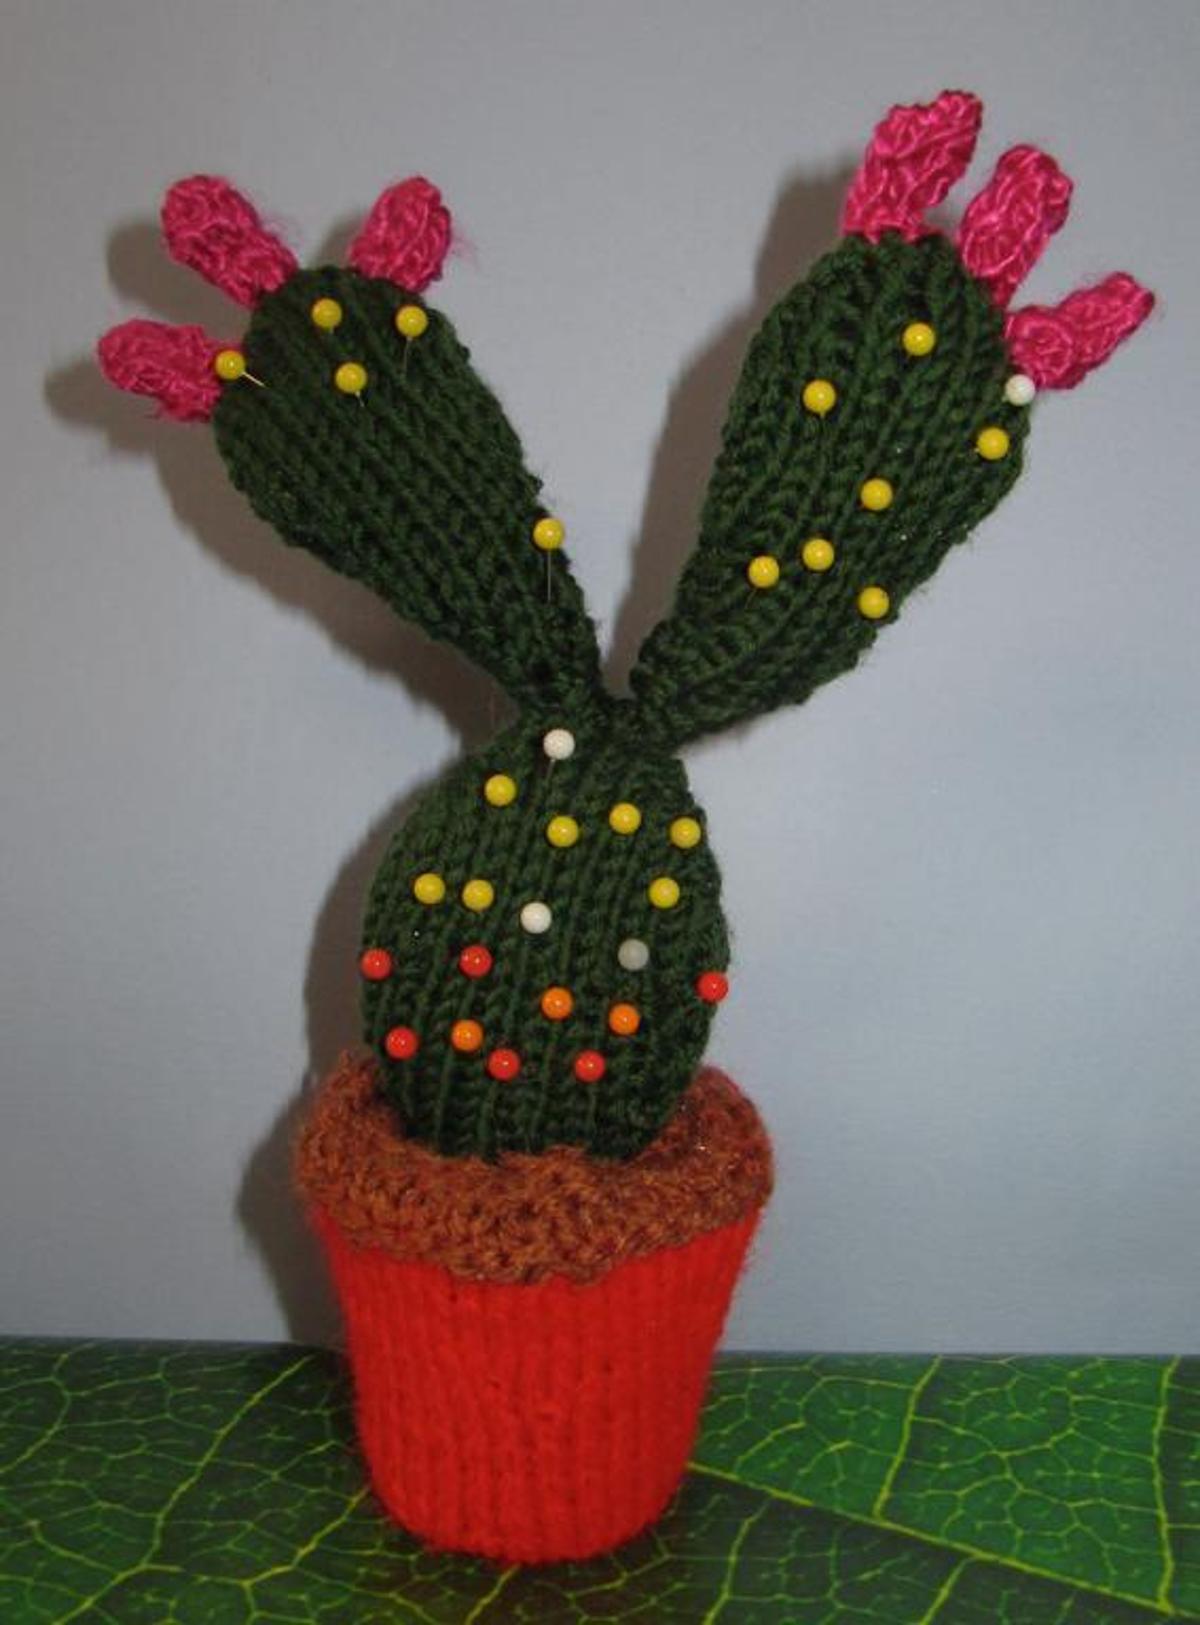 Knit Cactus Pin Cushion